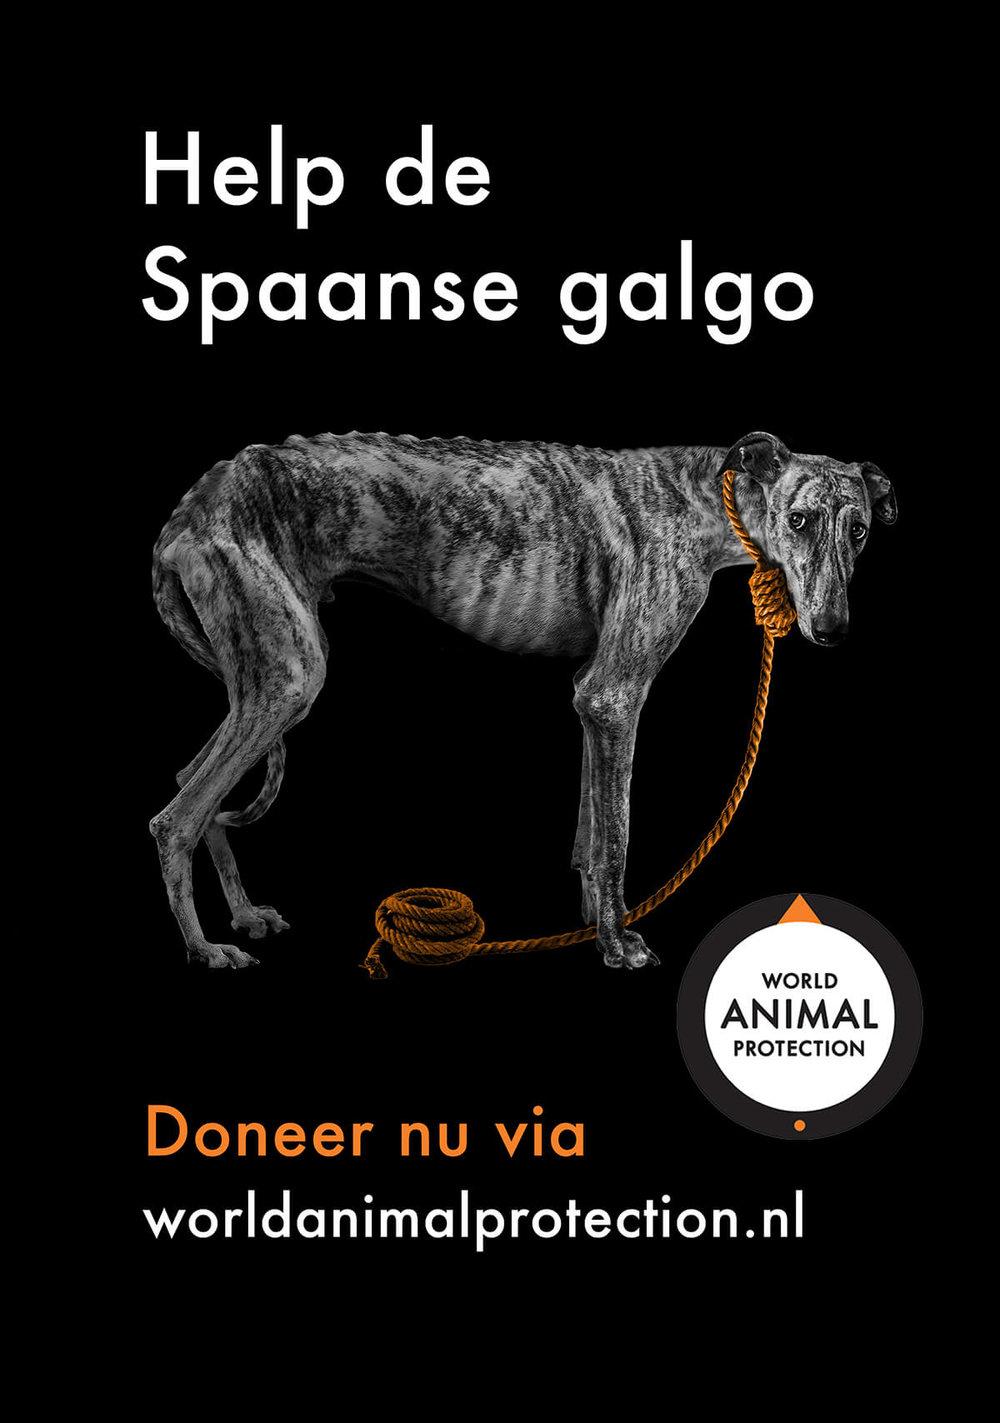 Poster Galgo.jpg